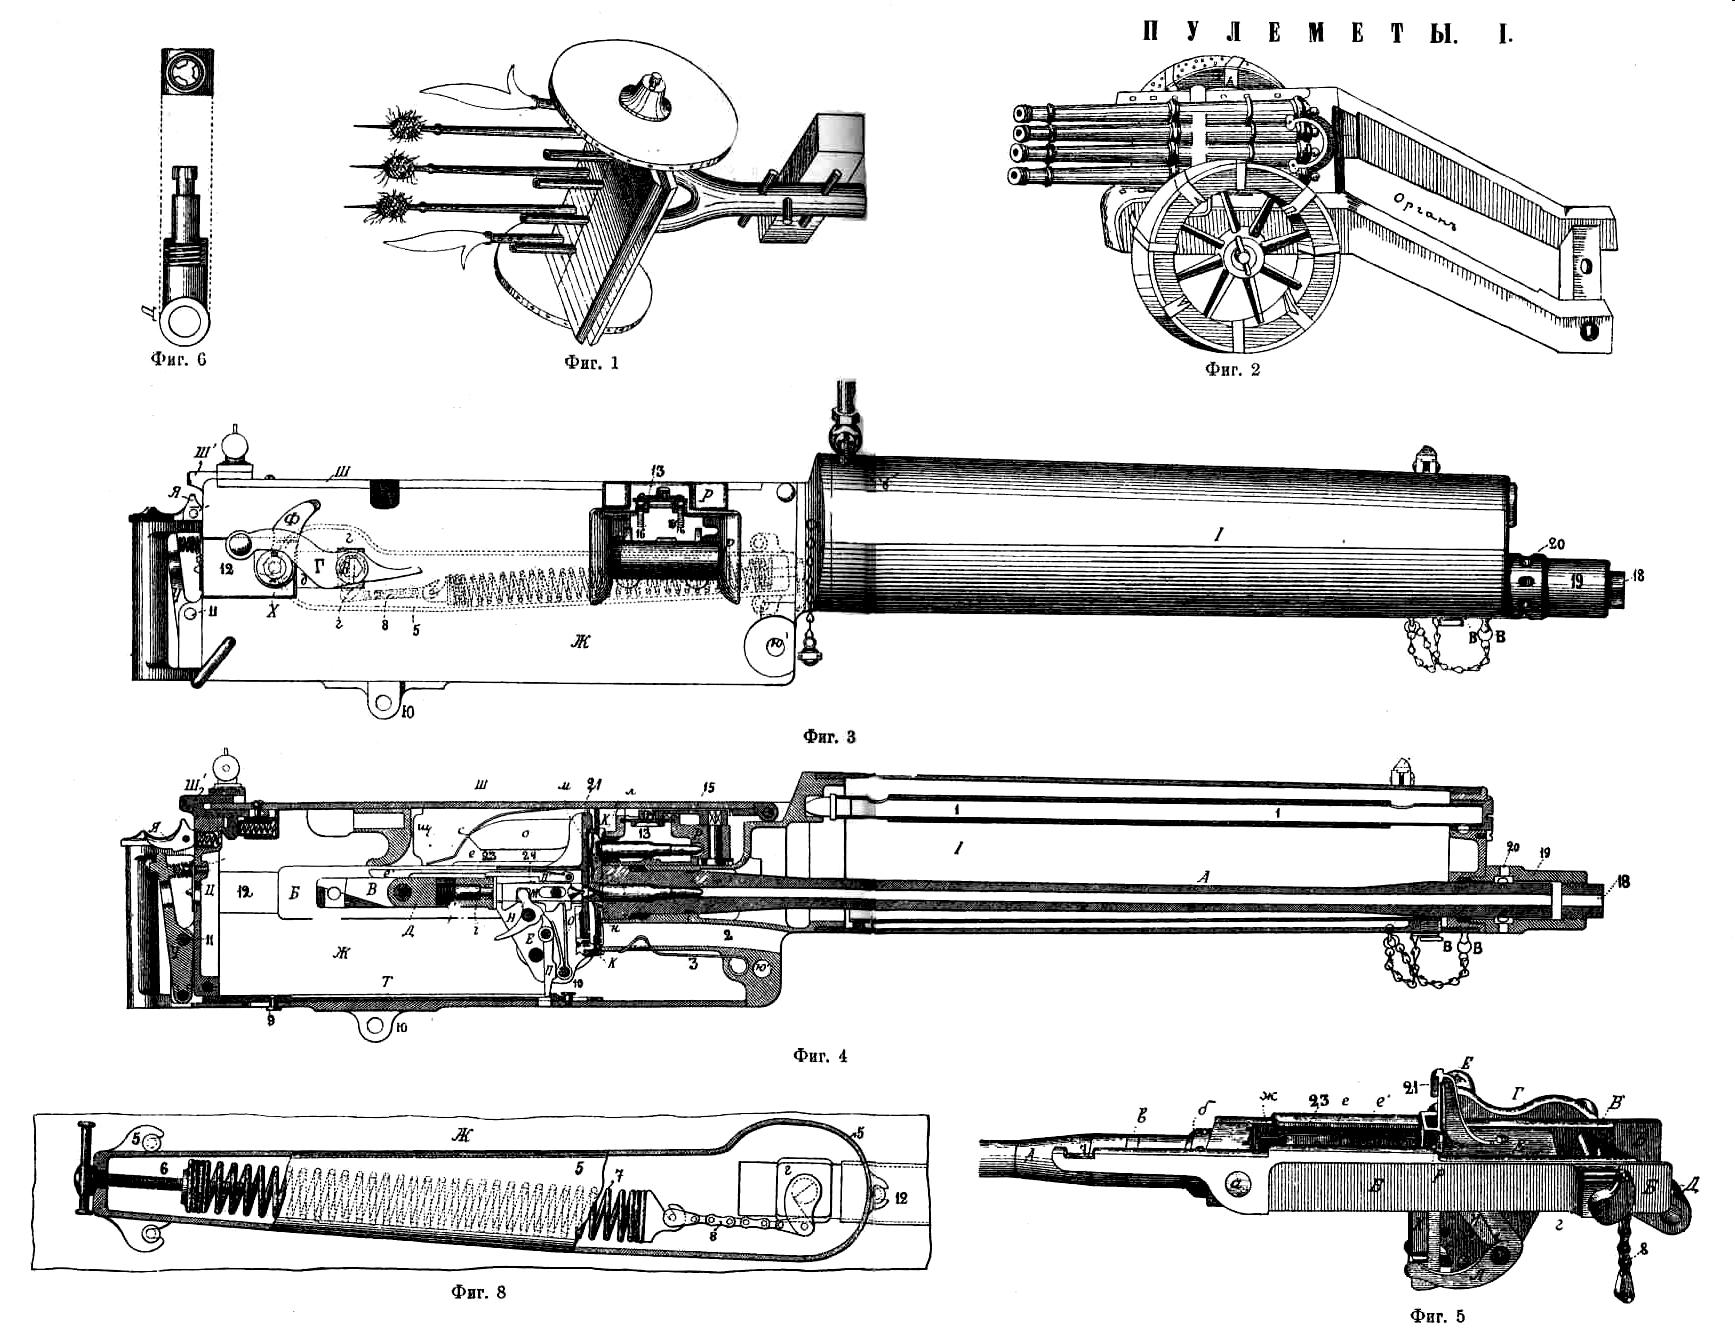 Drawn pistol blueprint Blueprint Maxim for Download blueprint